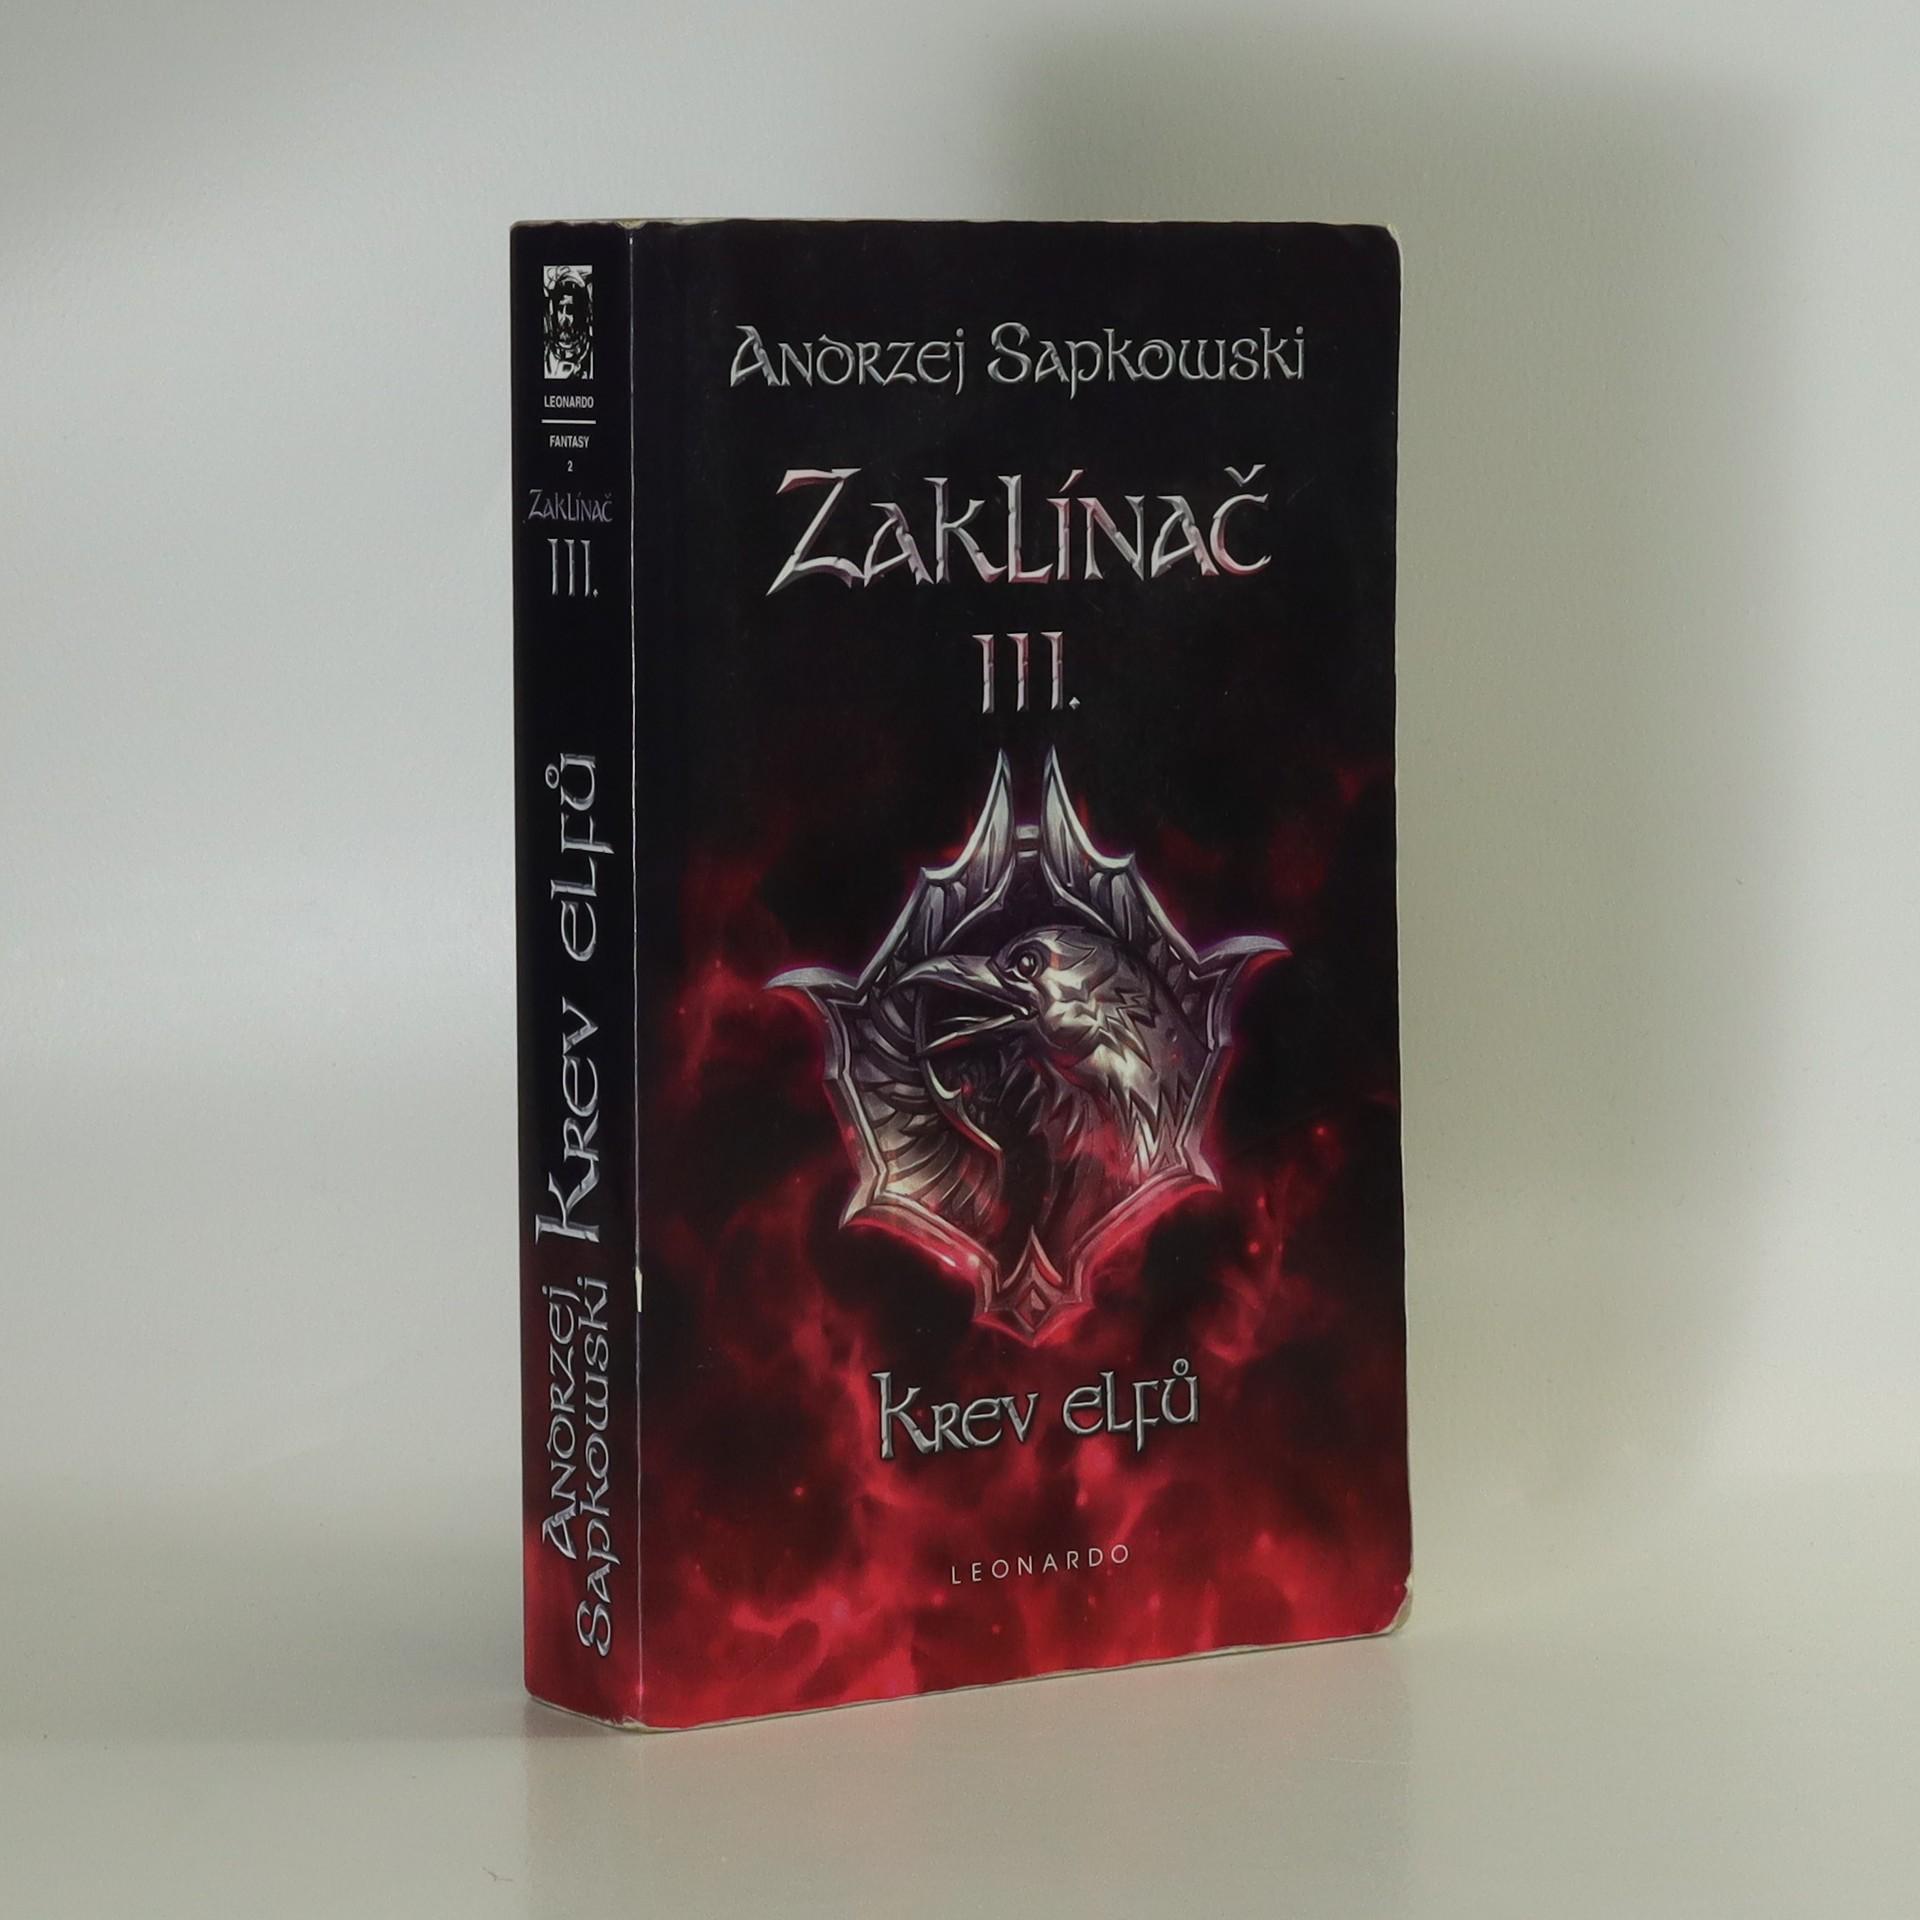 antikvární kniha Zaklínač. III., Krev elfů, 2011